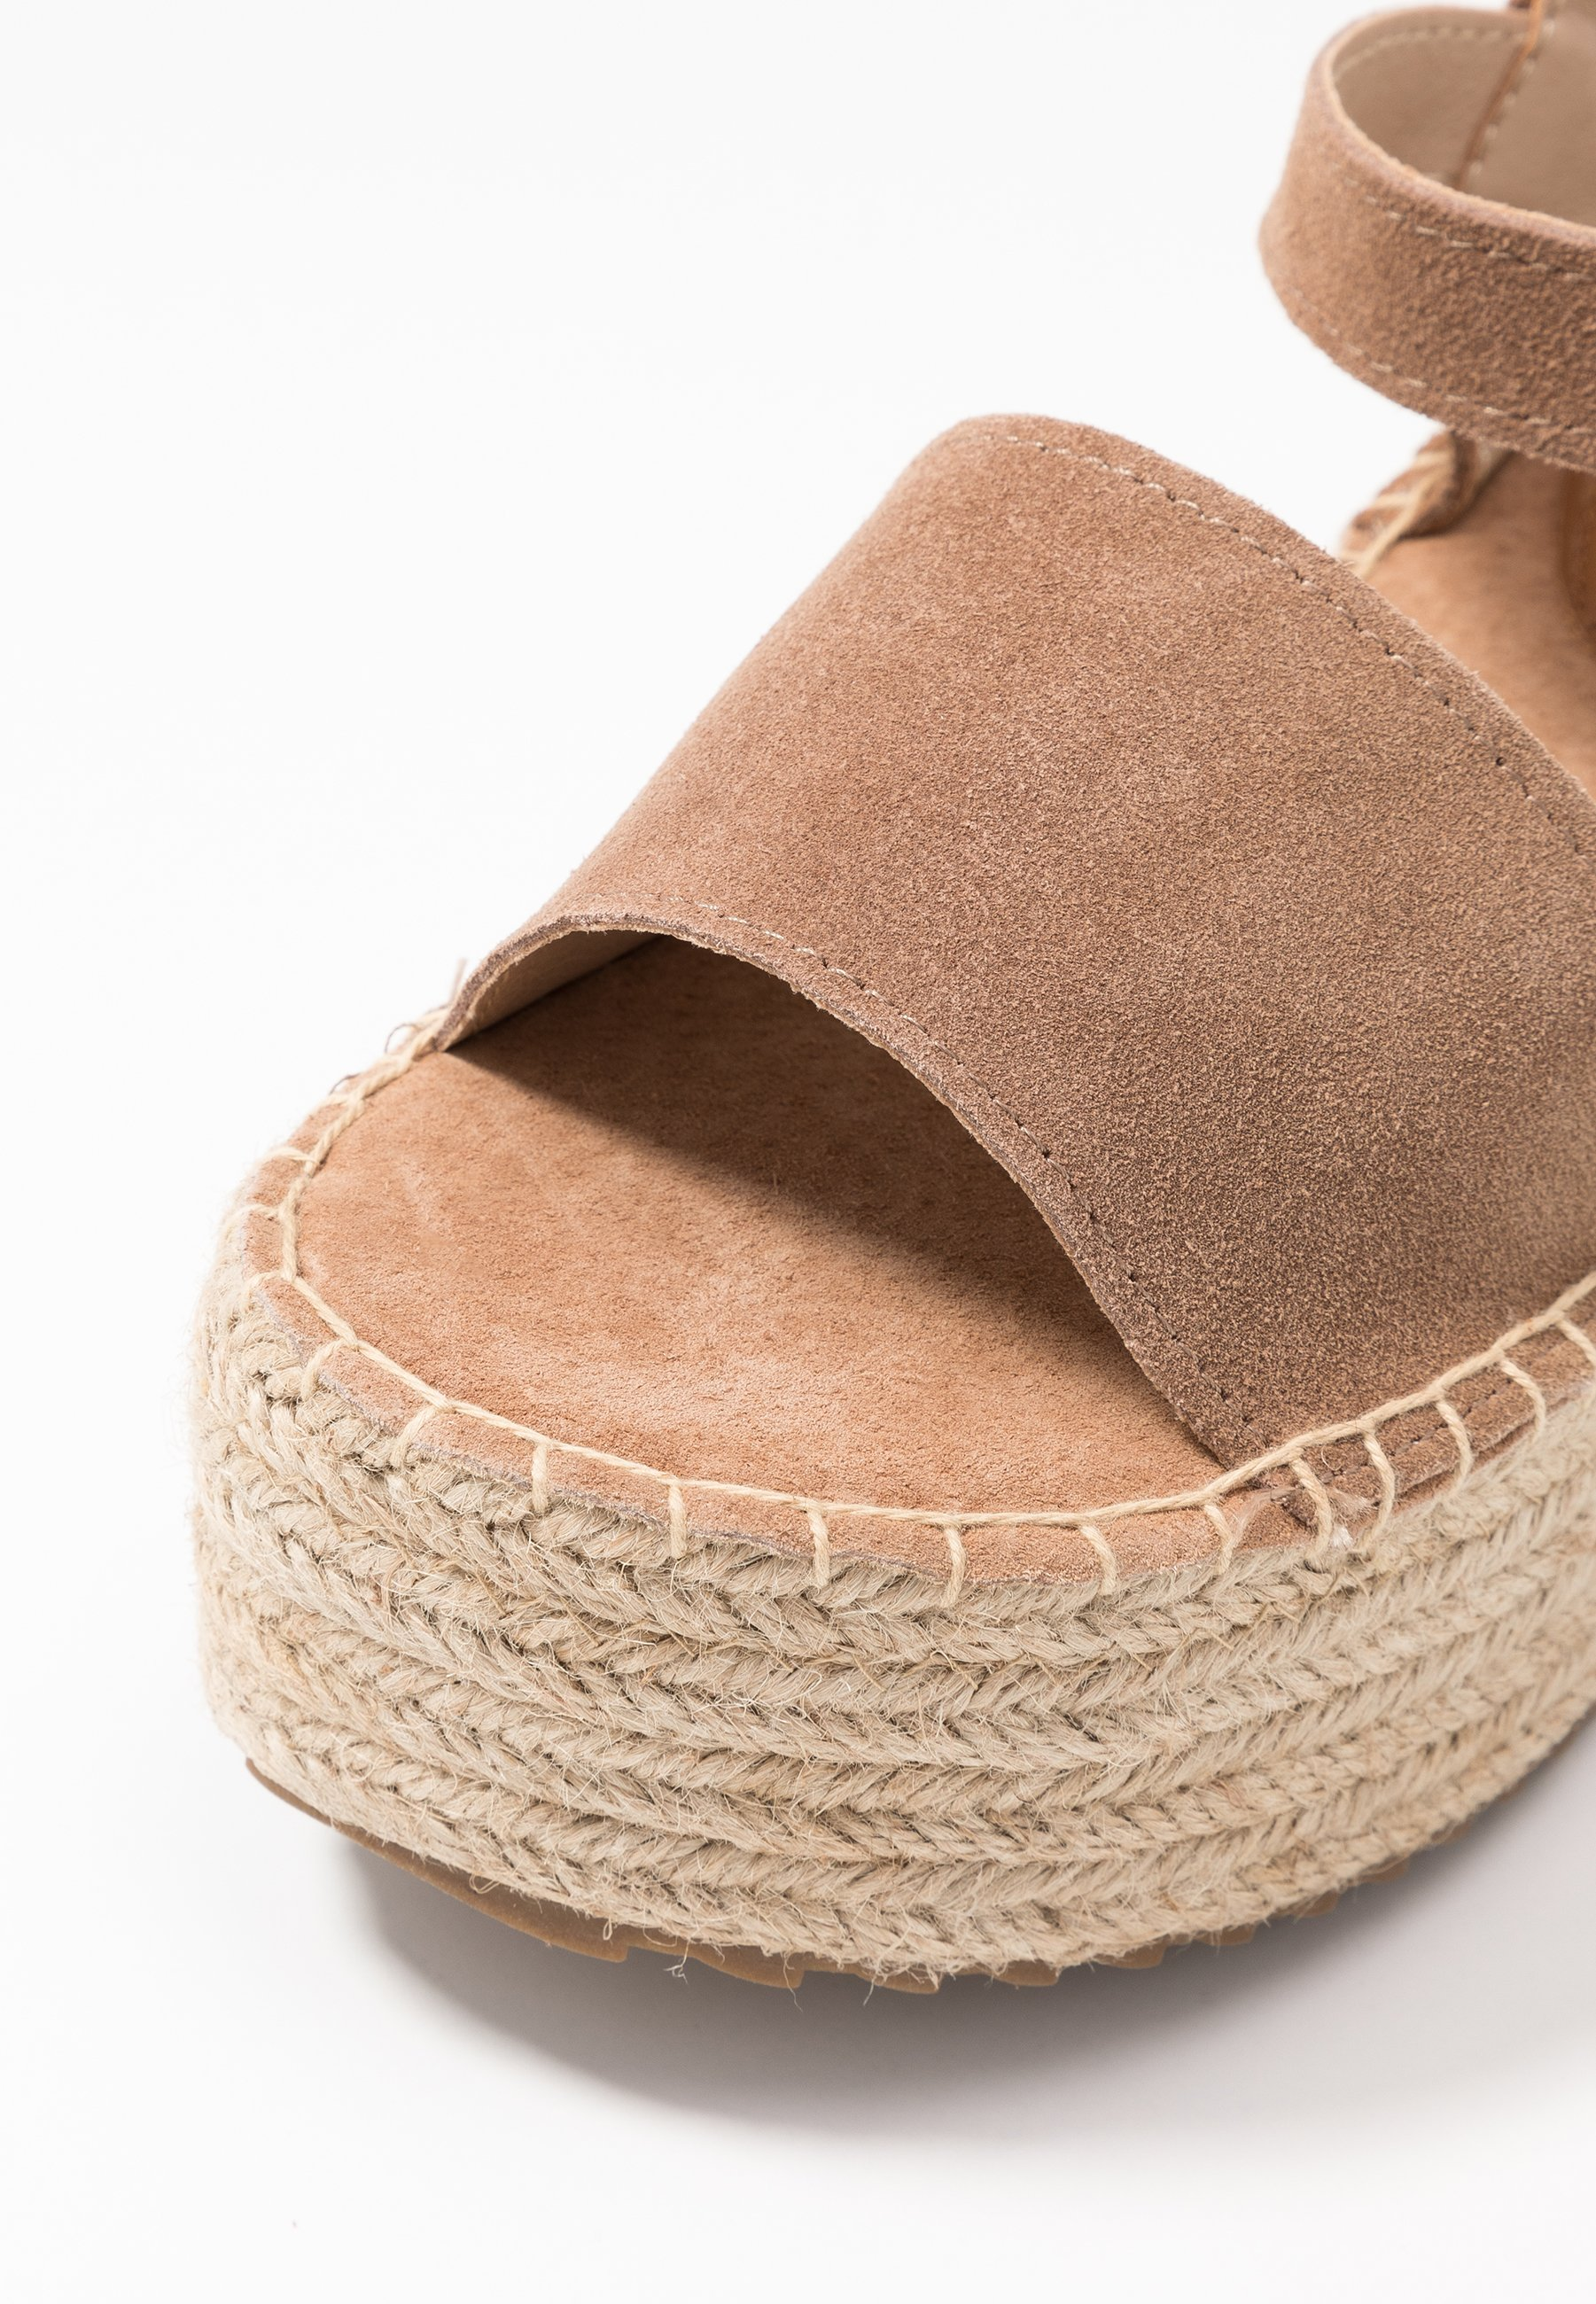 XTI Plateausandalette - camel | Damen Schuhe 2020